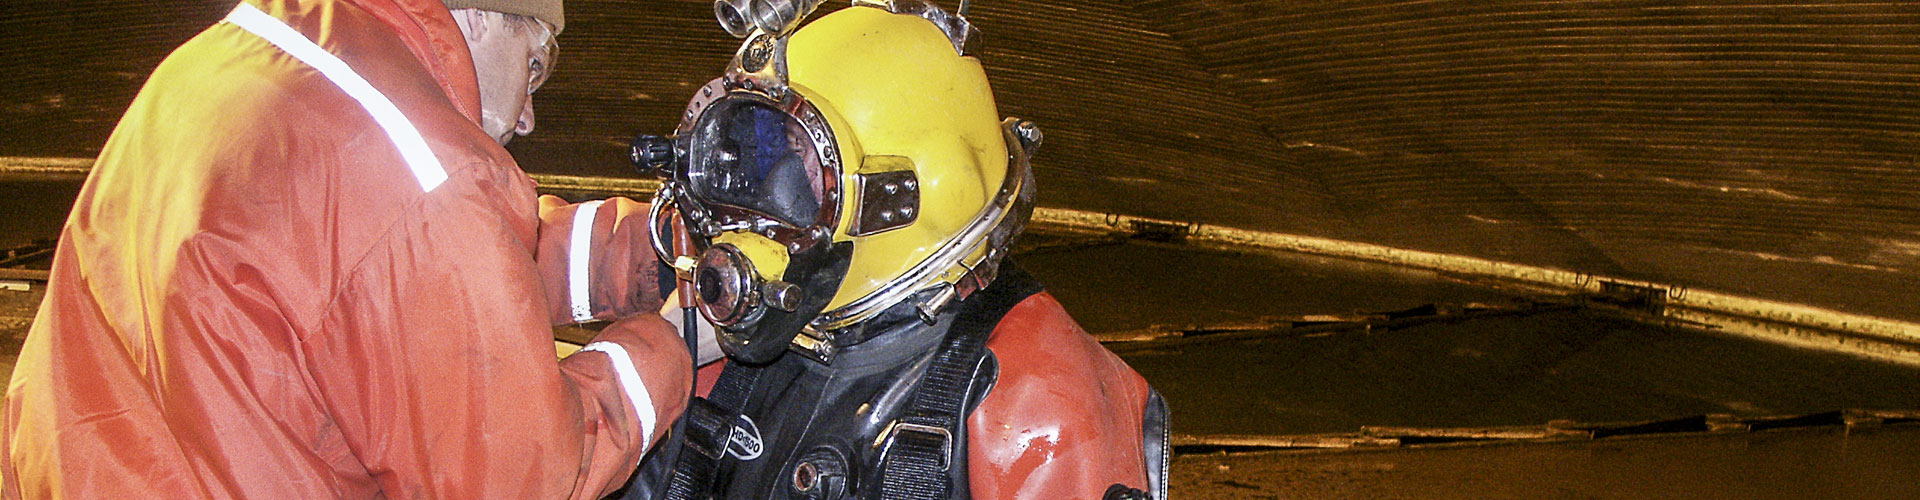 industrial diver, industrial divers, underwater construction, underwater inspections, adci certified divers